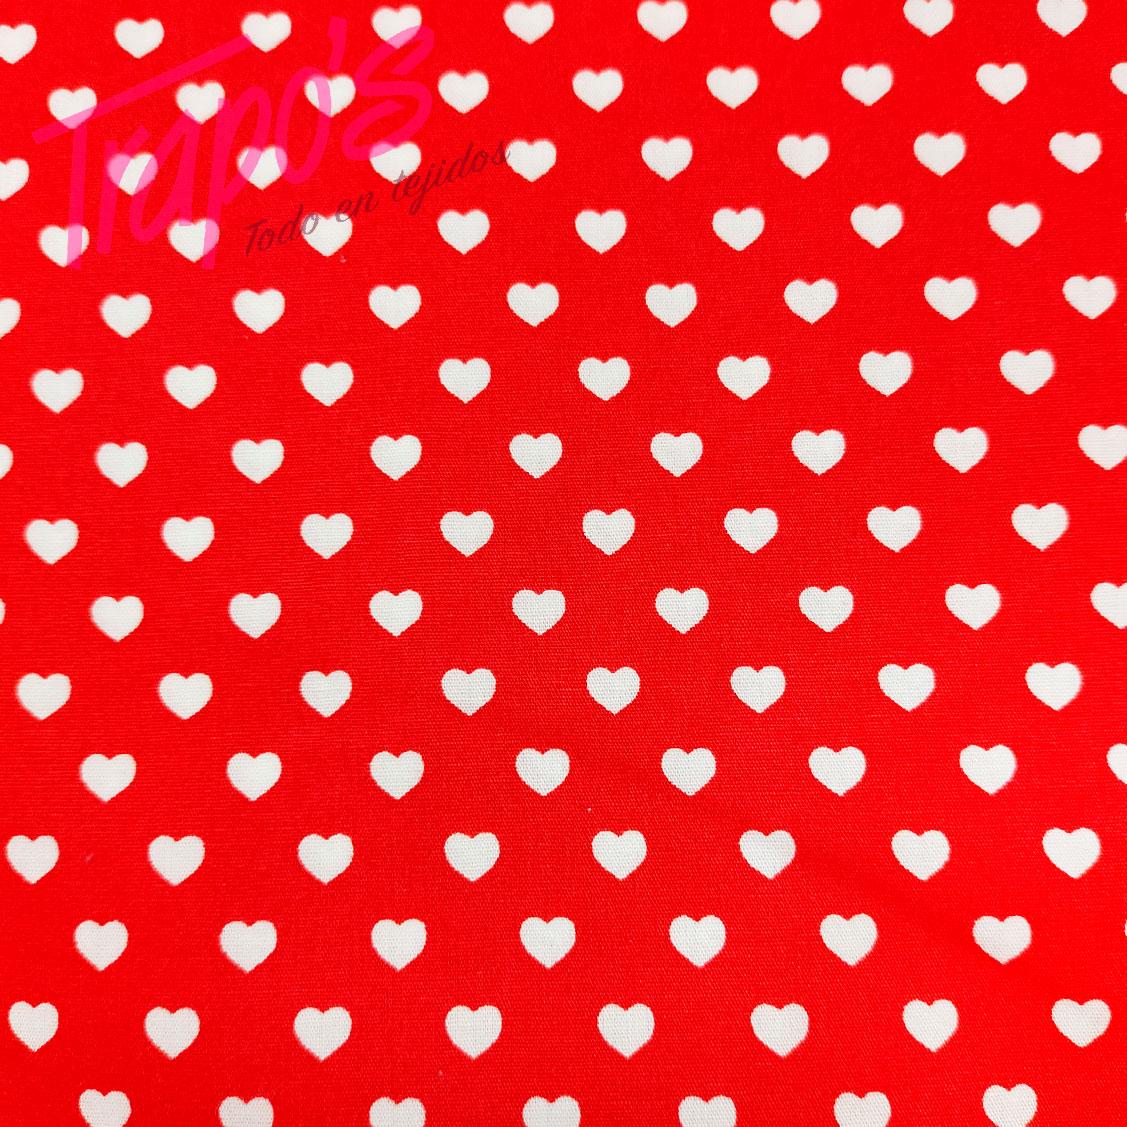 corazon-rojo2